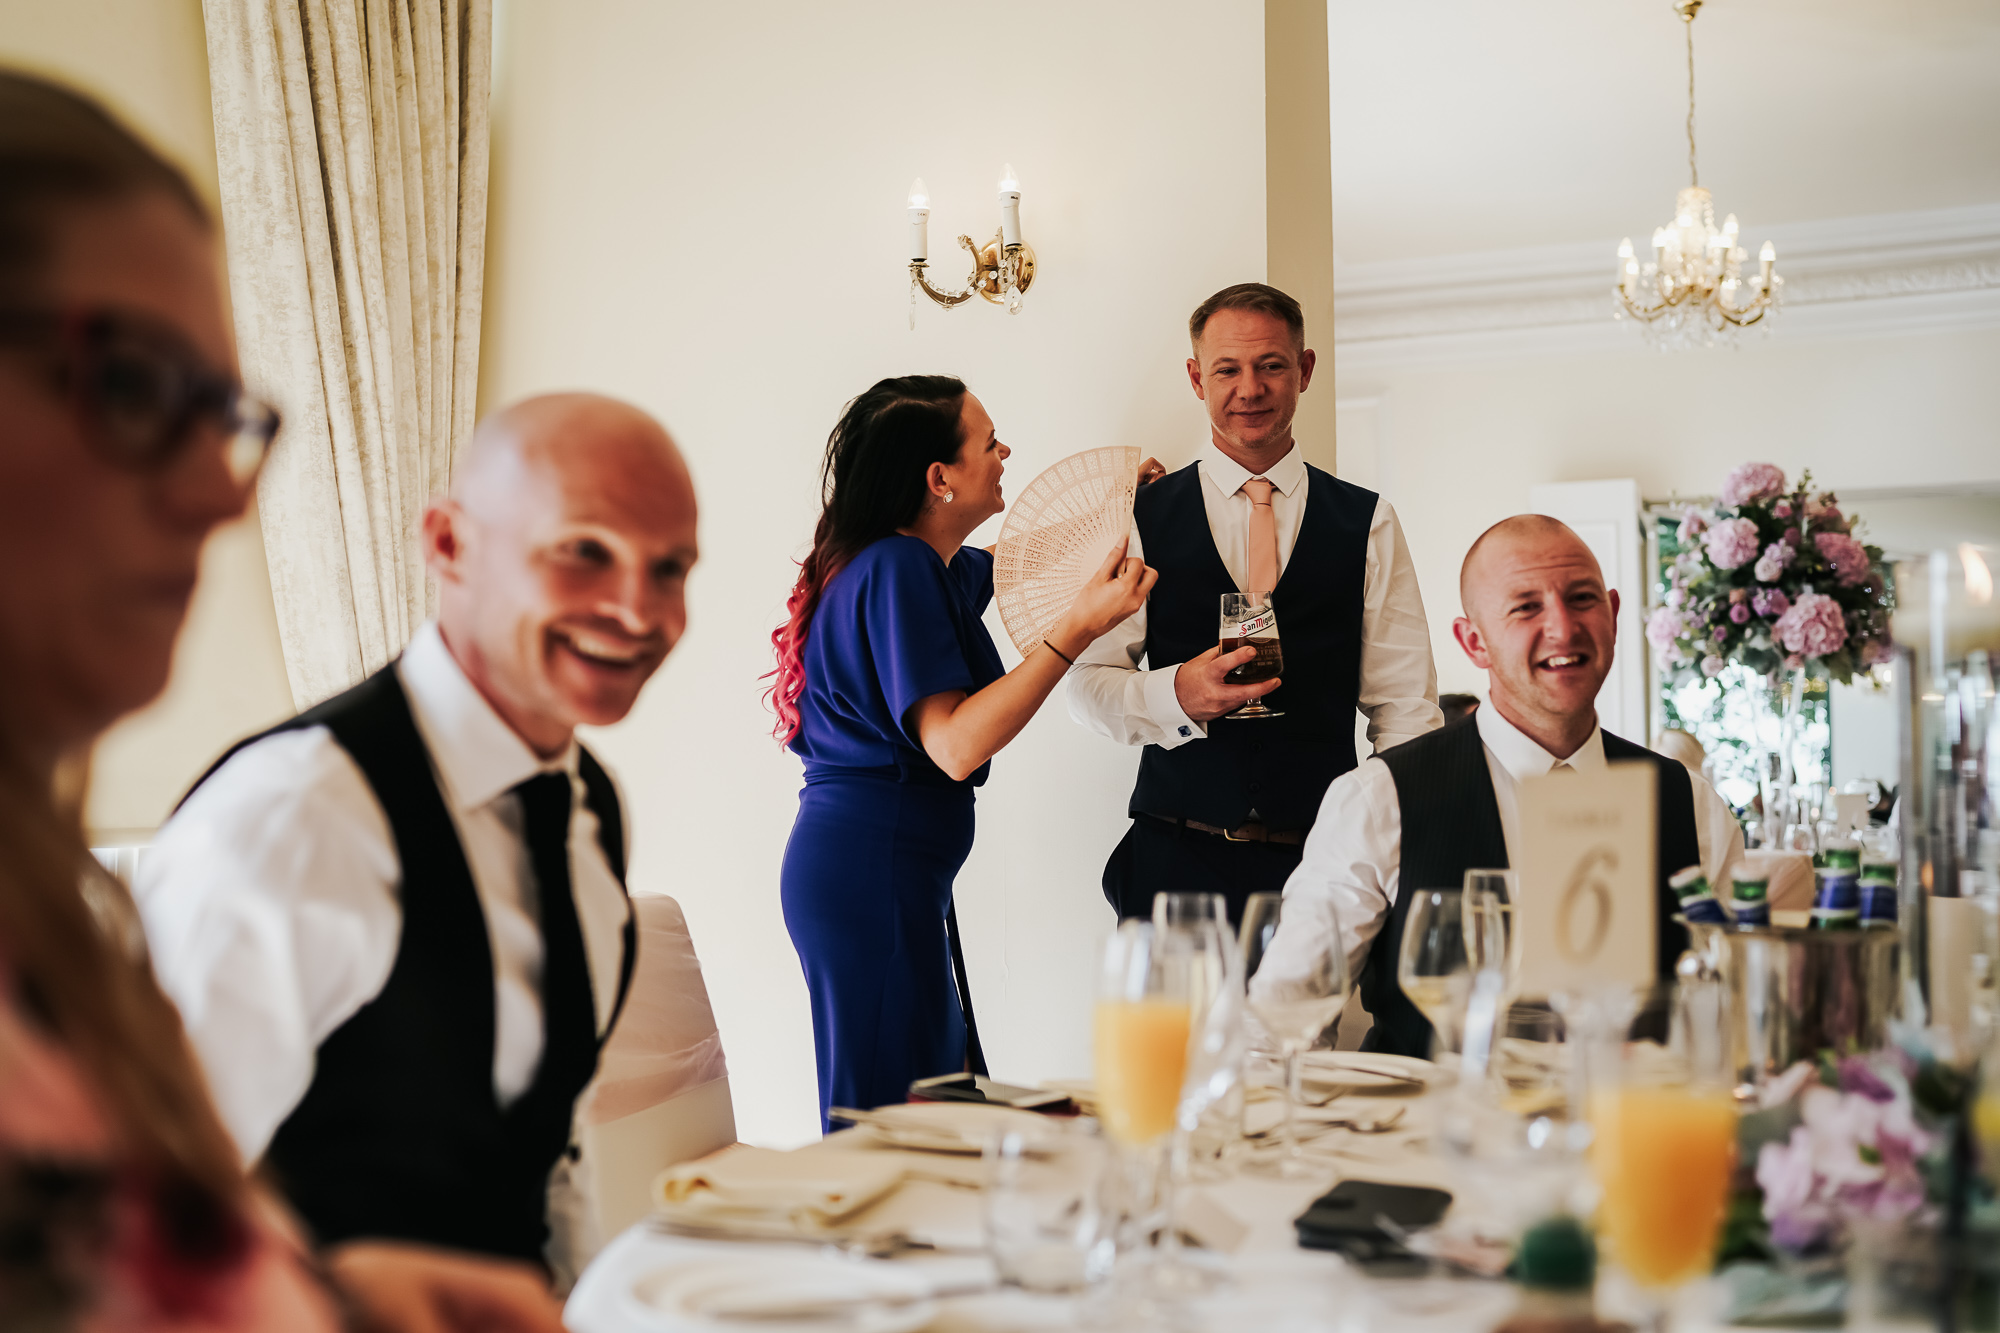 West Tower Wedding Venue Orkskirk Lancashire Wedding Photography cheshire wedding photographer (34 of 47).jpg